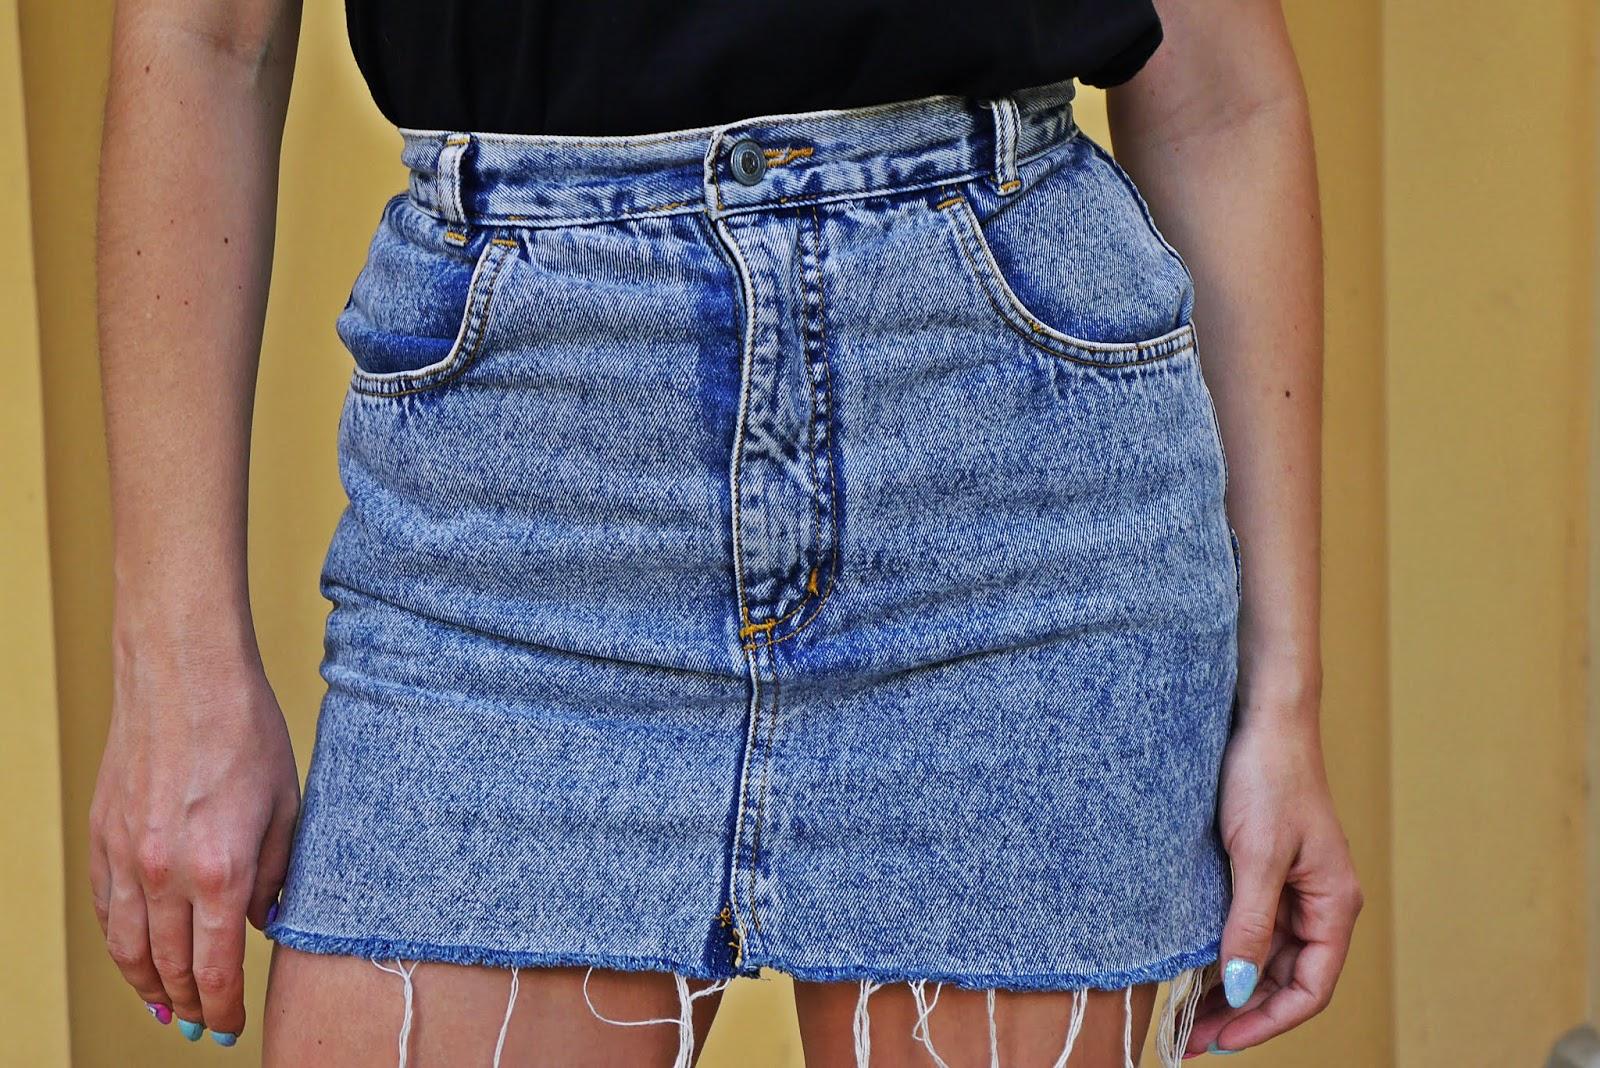 5_jurassic_park_t-hirt_spodnica_jeans_botki_skarpetki_renee_karyn_blog_modowy_080718